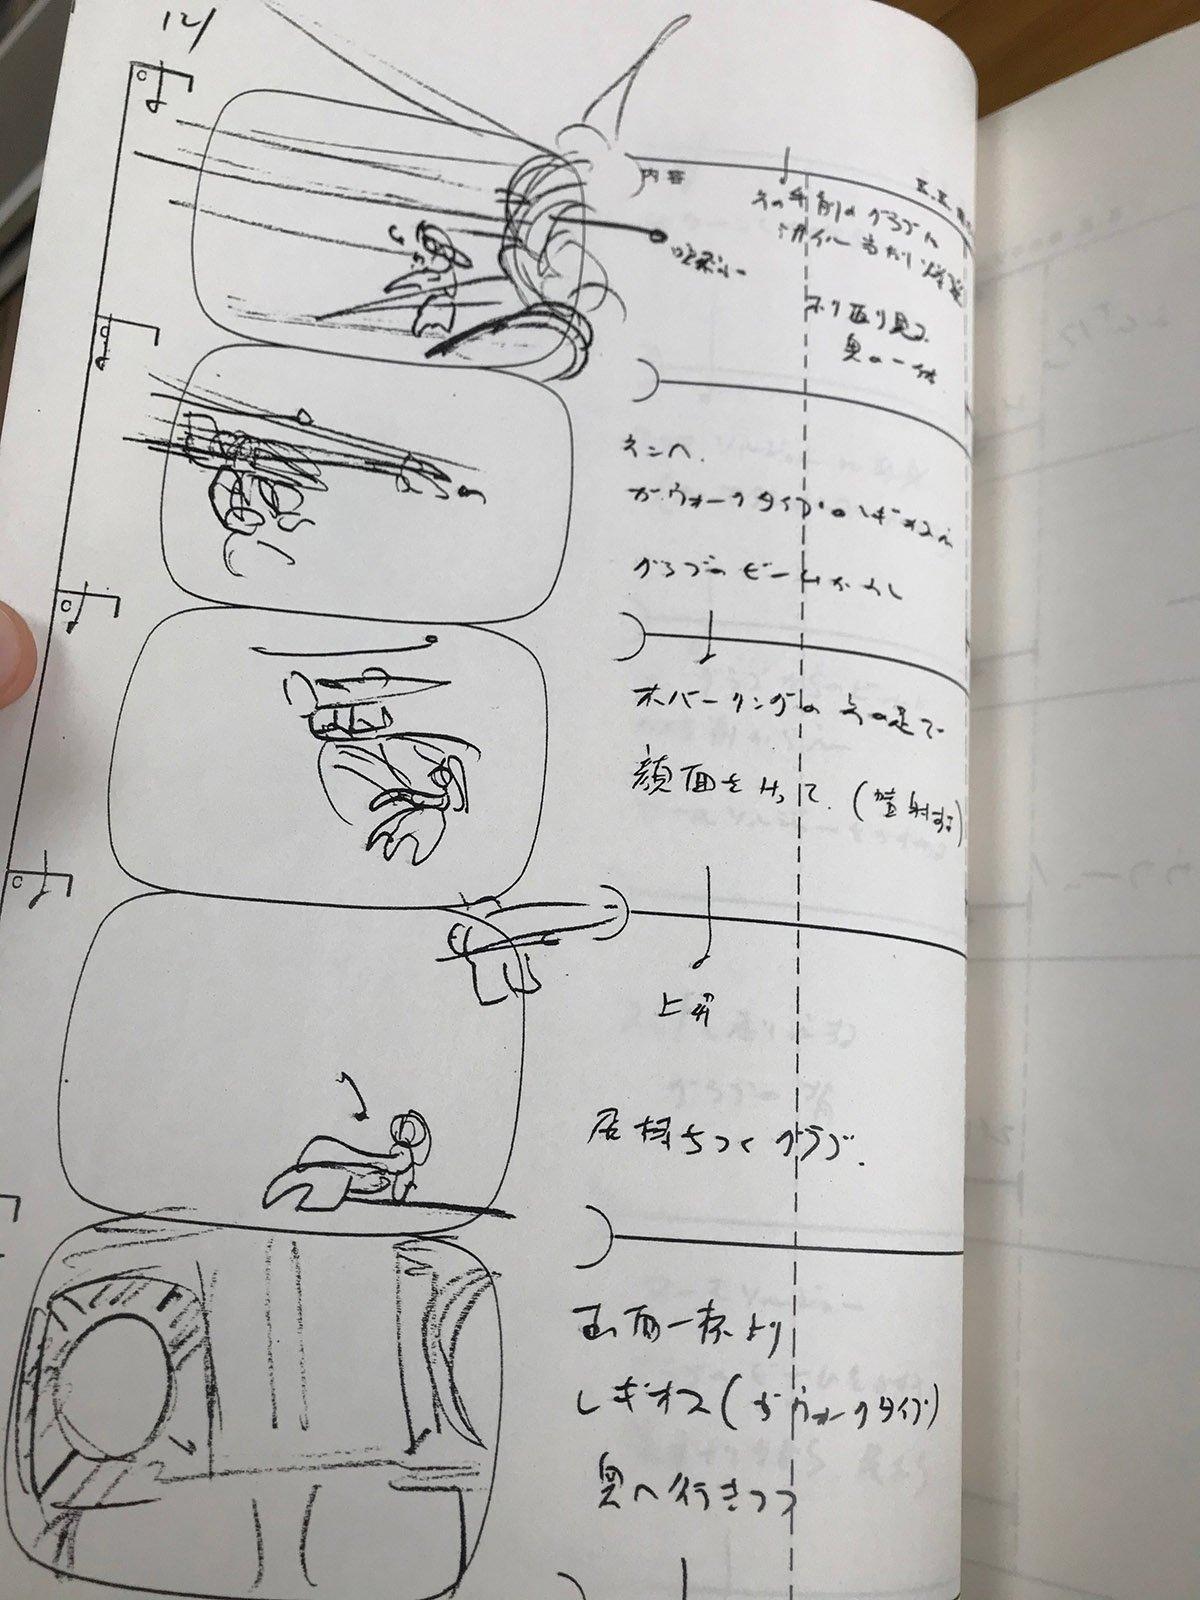 storyboards.jpg.e3fac0355c9bae07573eda0a7023ffd6.jpg